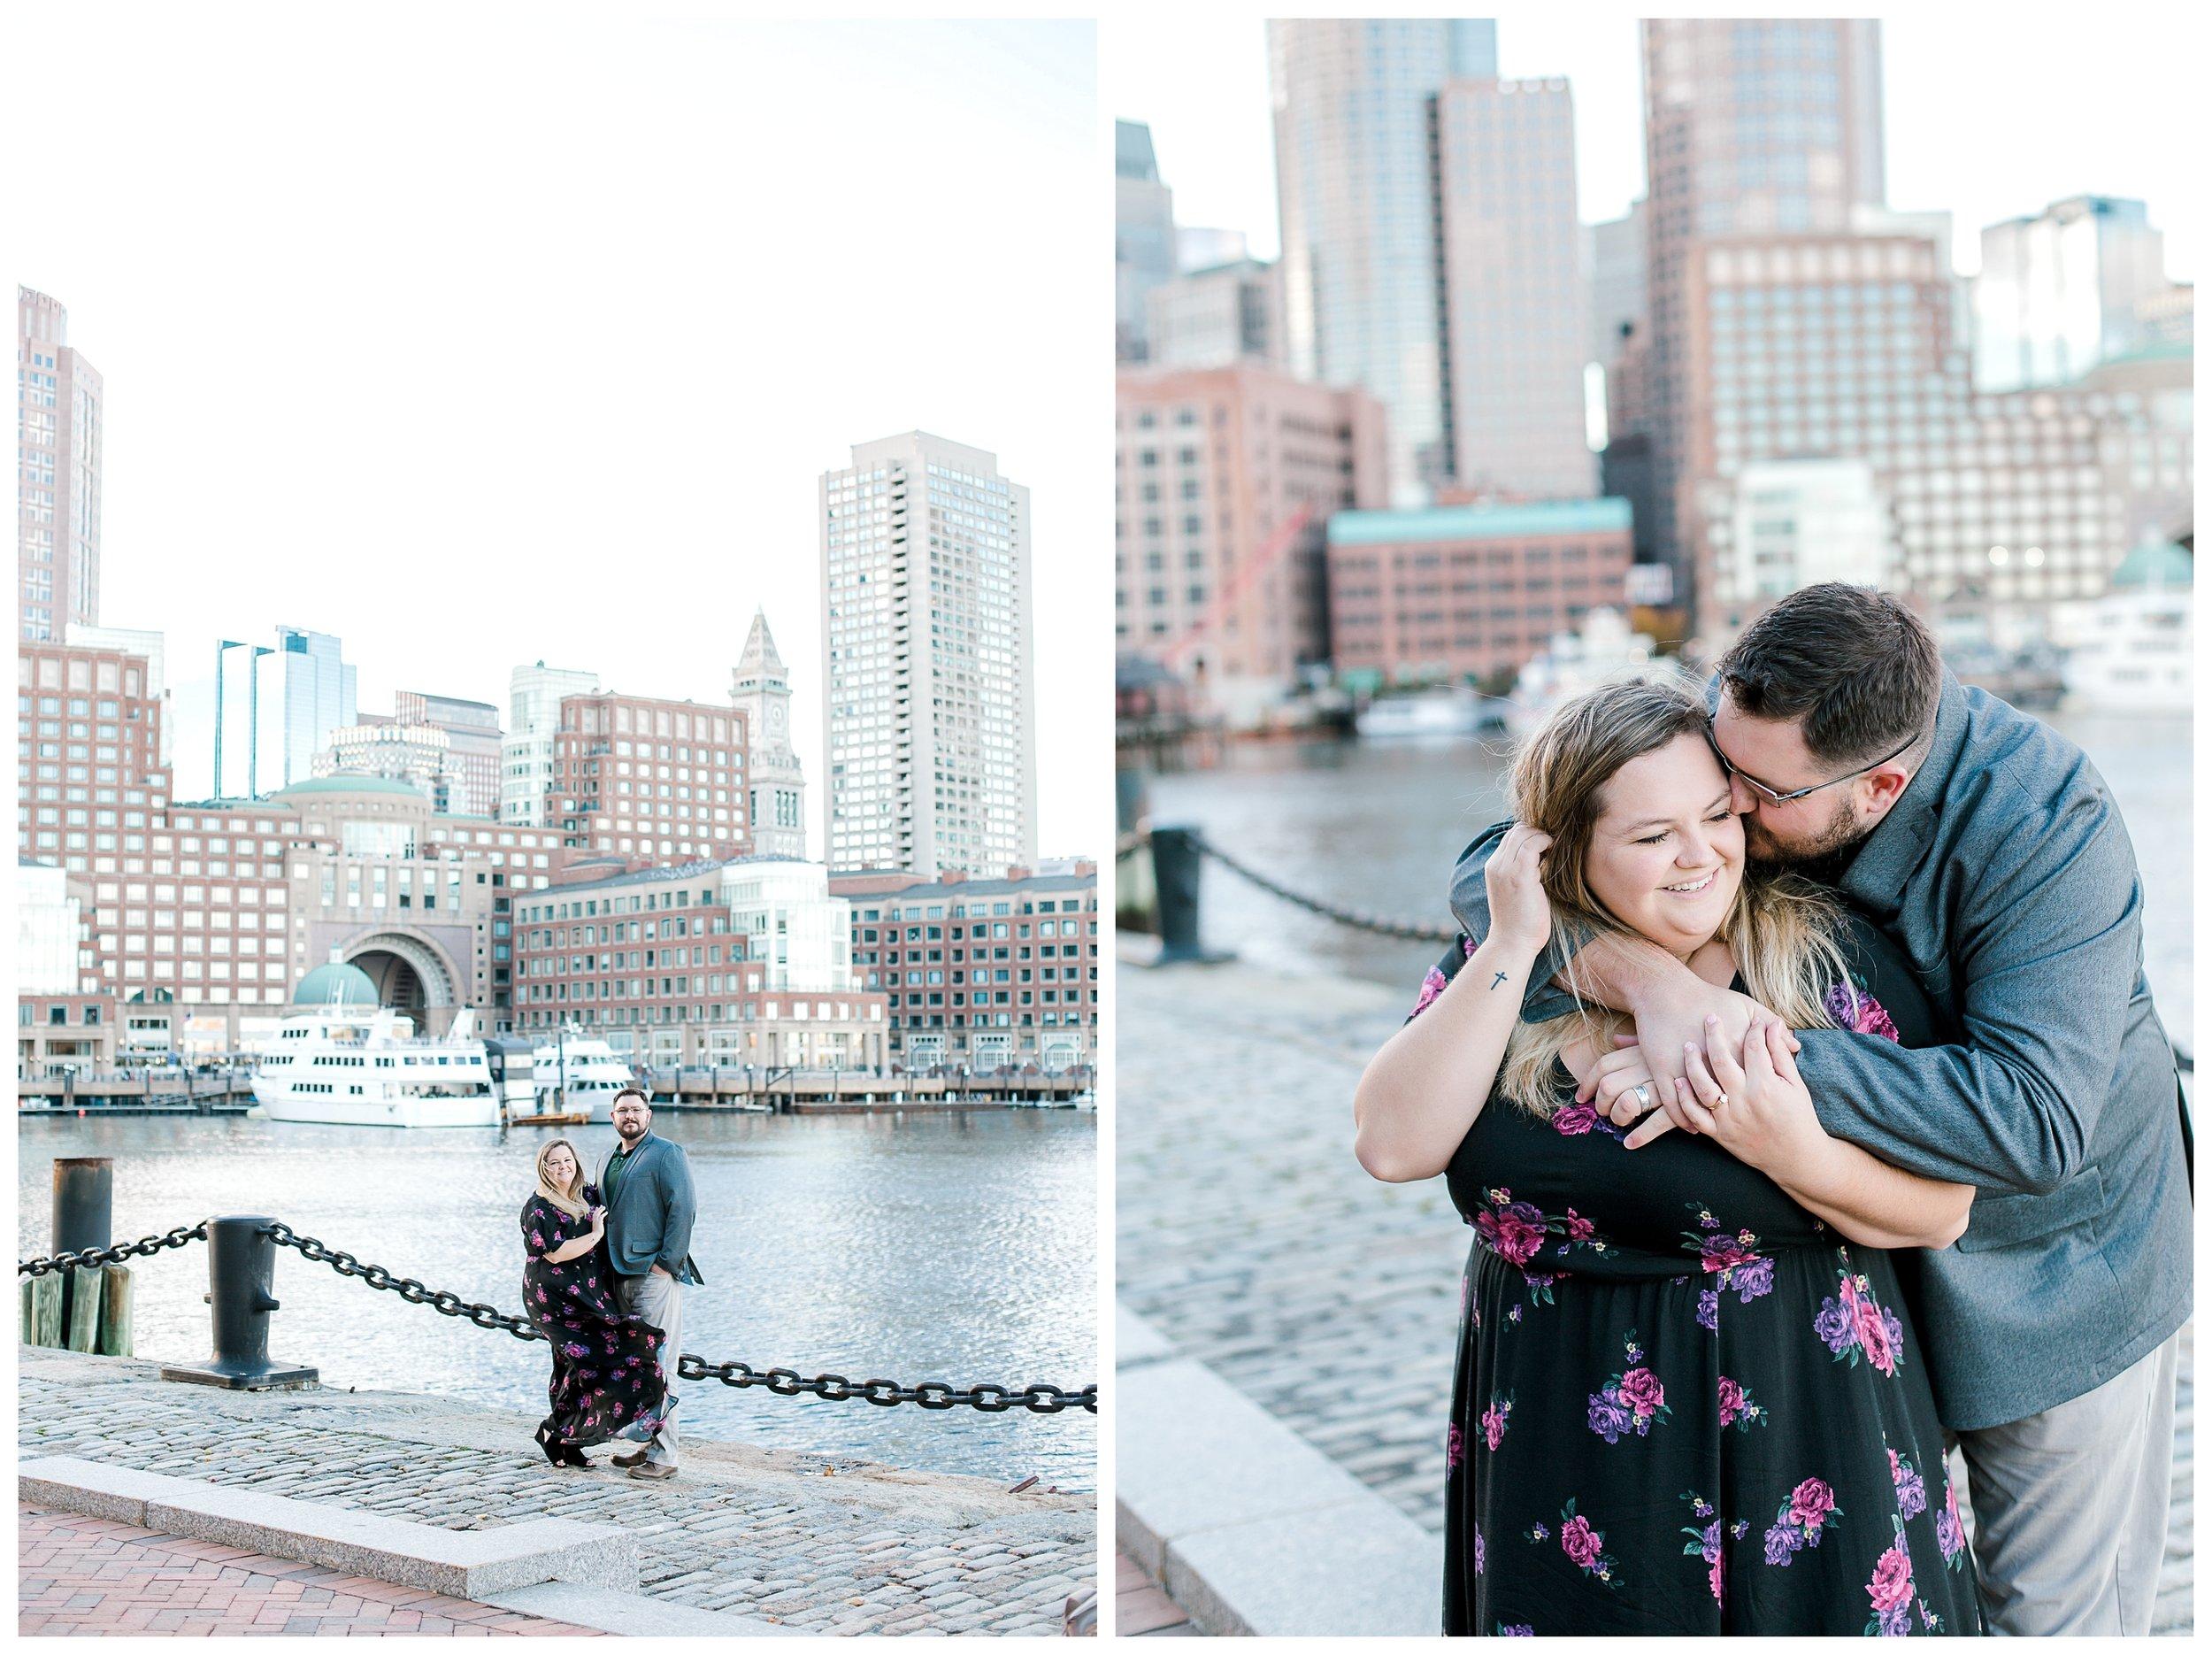 fan_pier_engagement_photos_boston_photographer_erica_pezente_photography (1).jpg